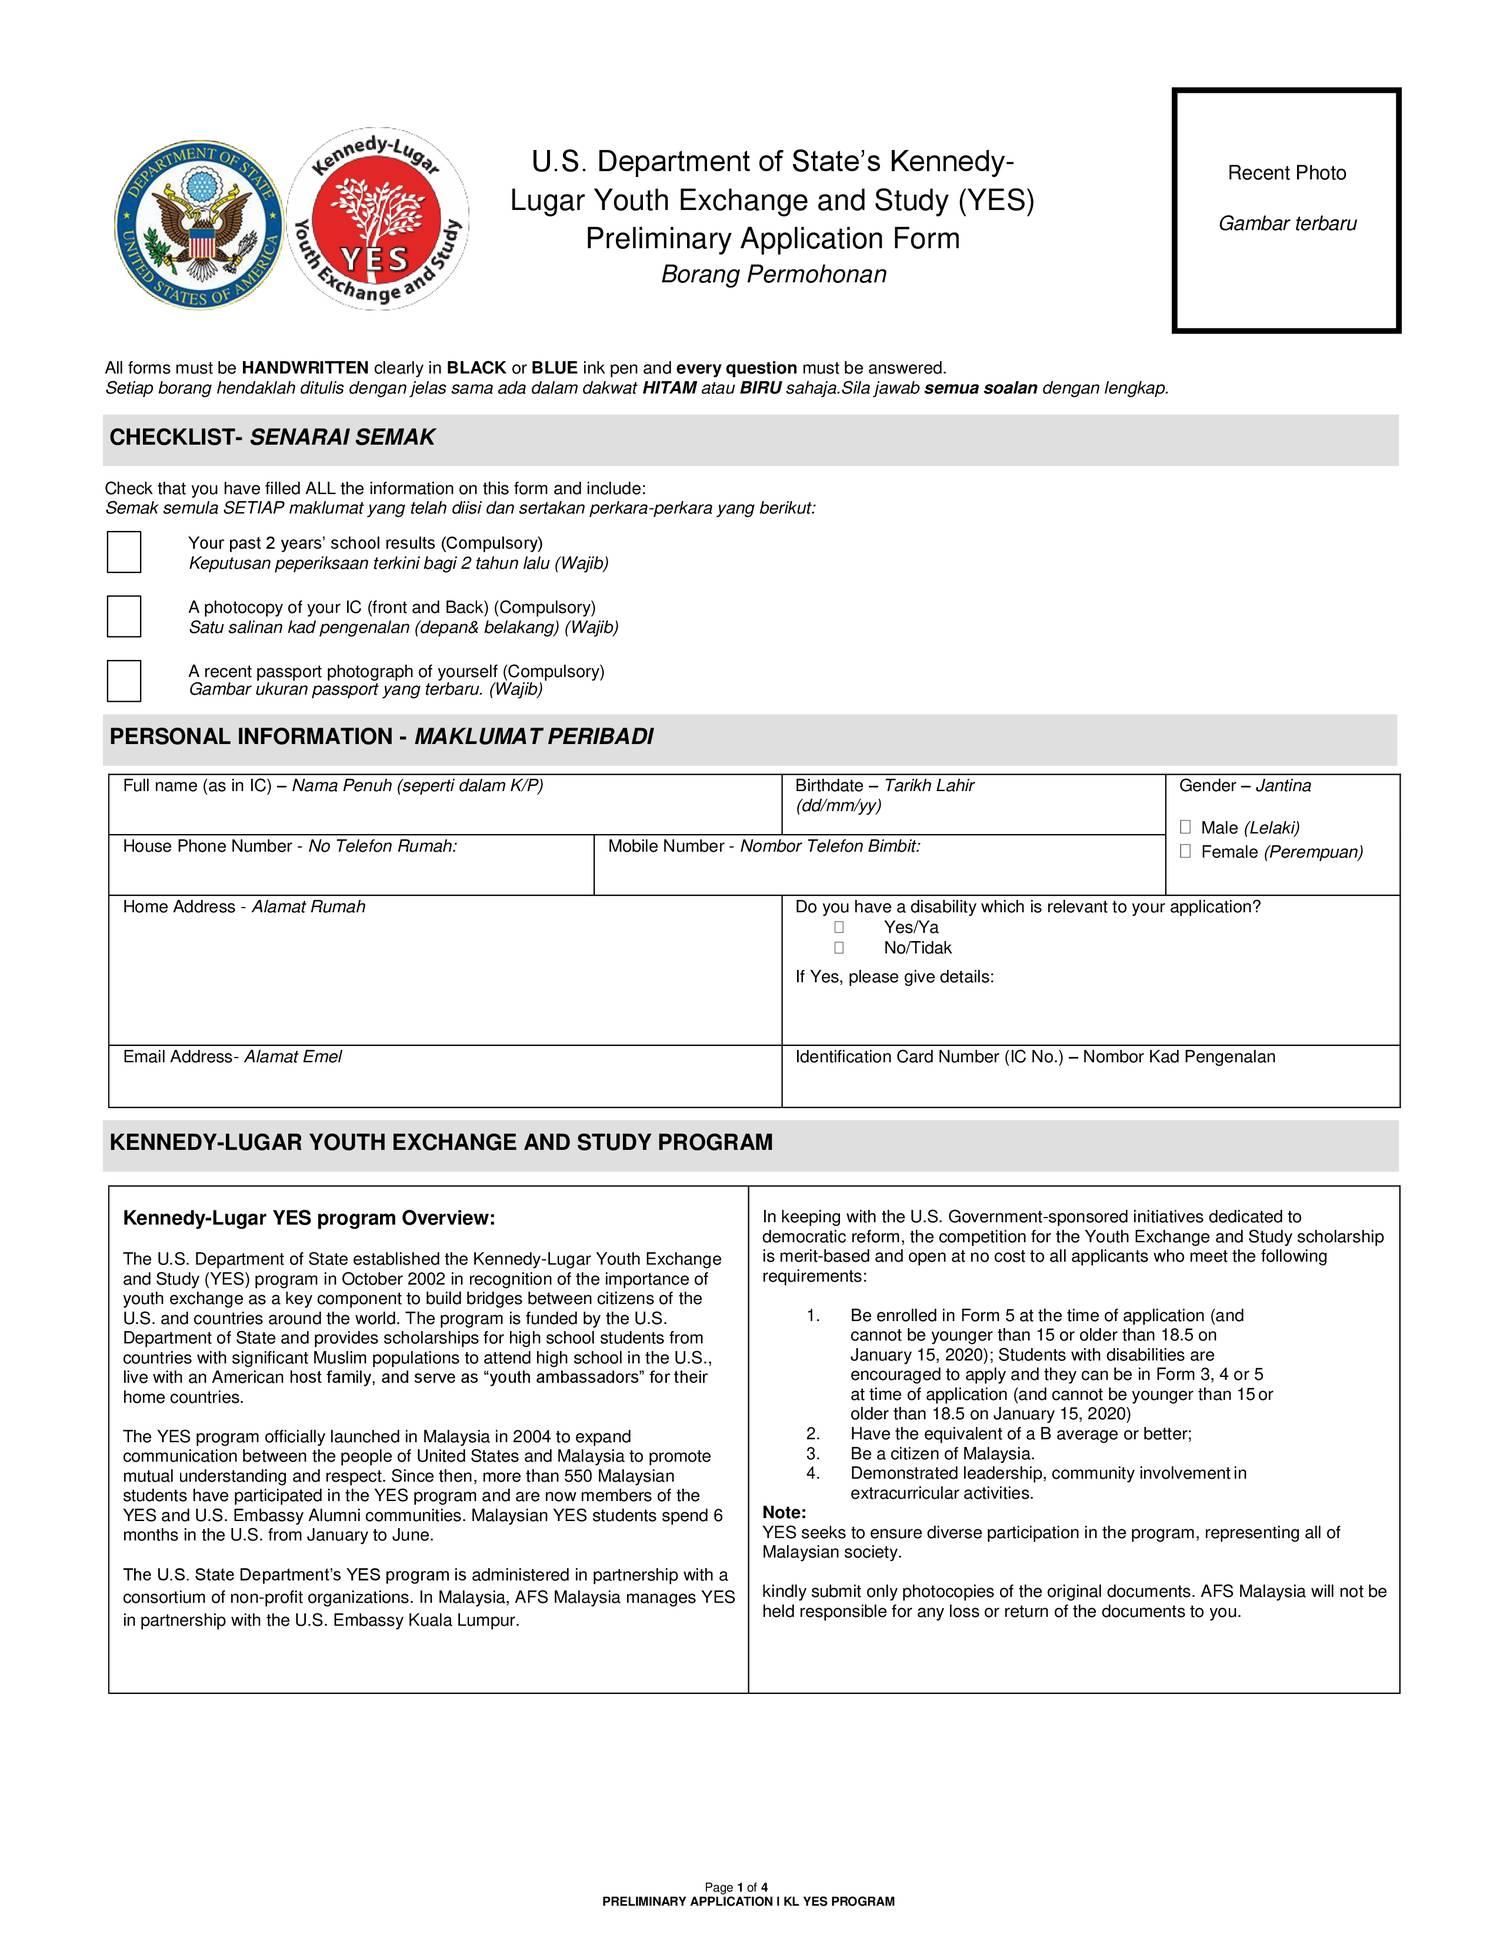 yes-preliminary-application-form-2020 Ta Application Form on sample rental, credit card, blank scholarship, free sample job, examples job, sample scholarship, free printable job,